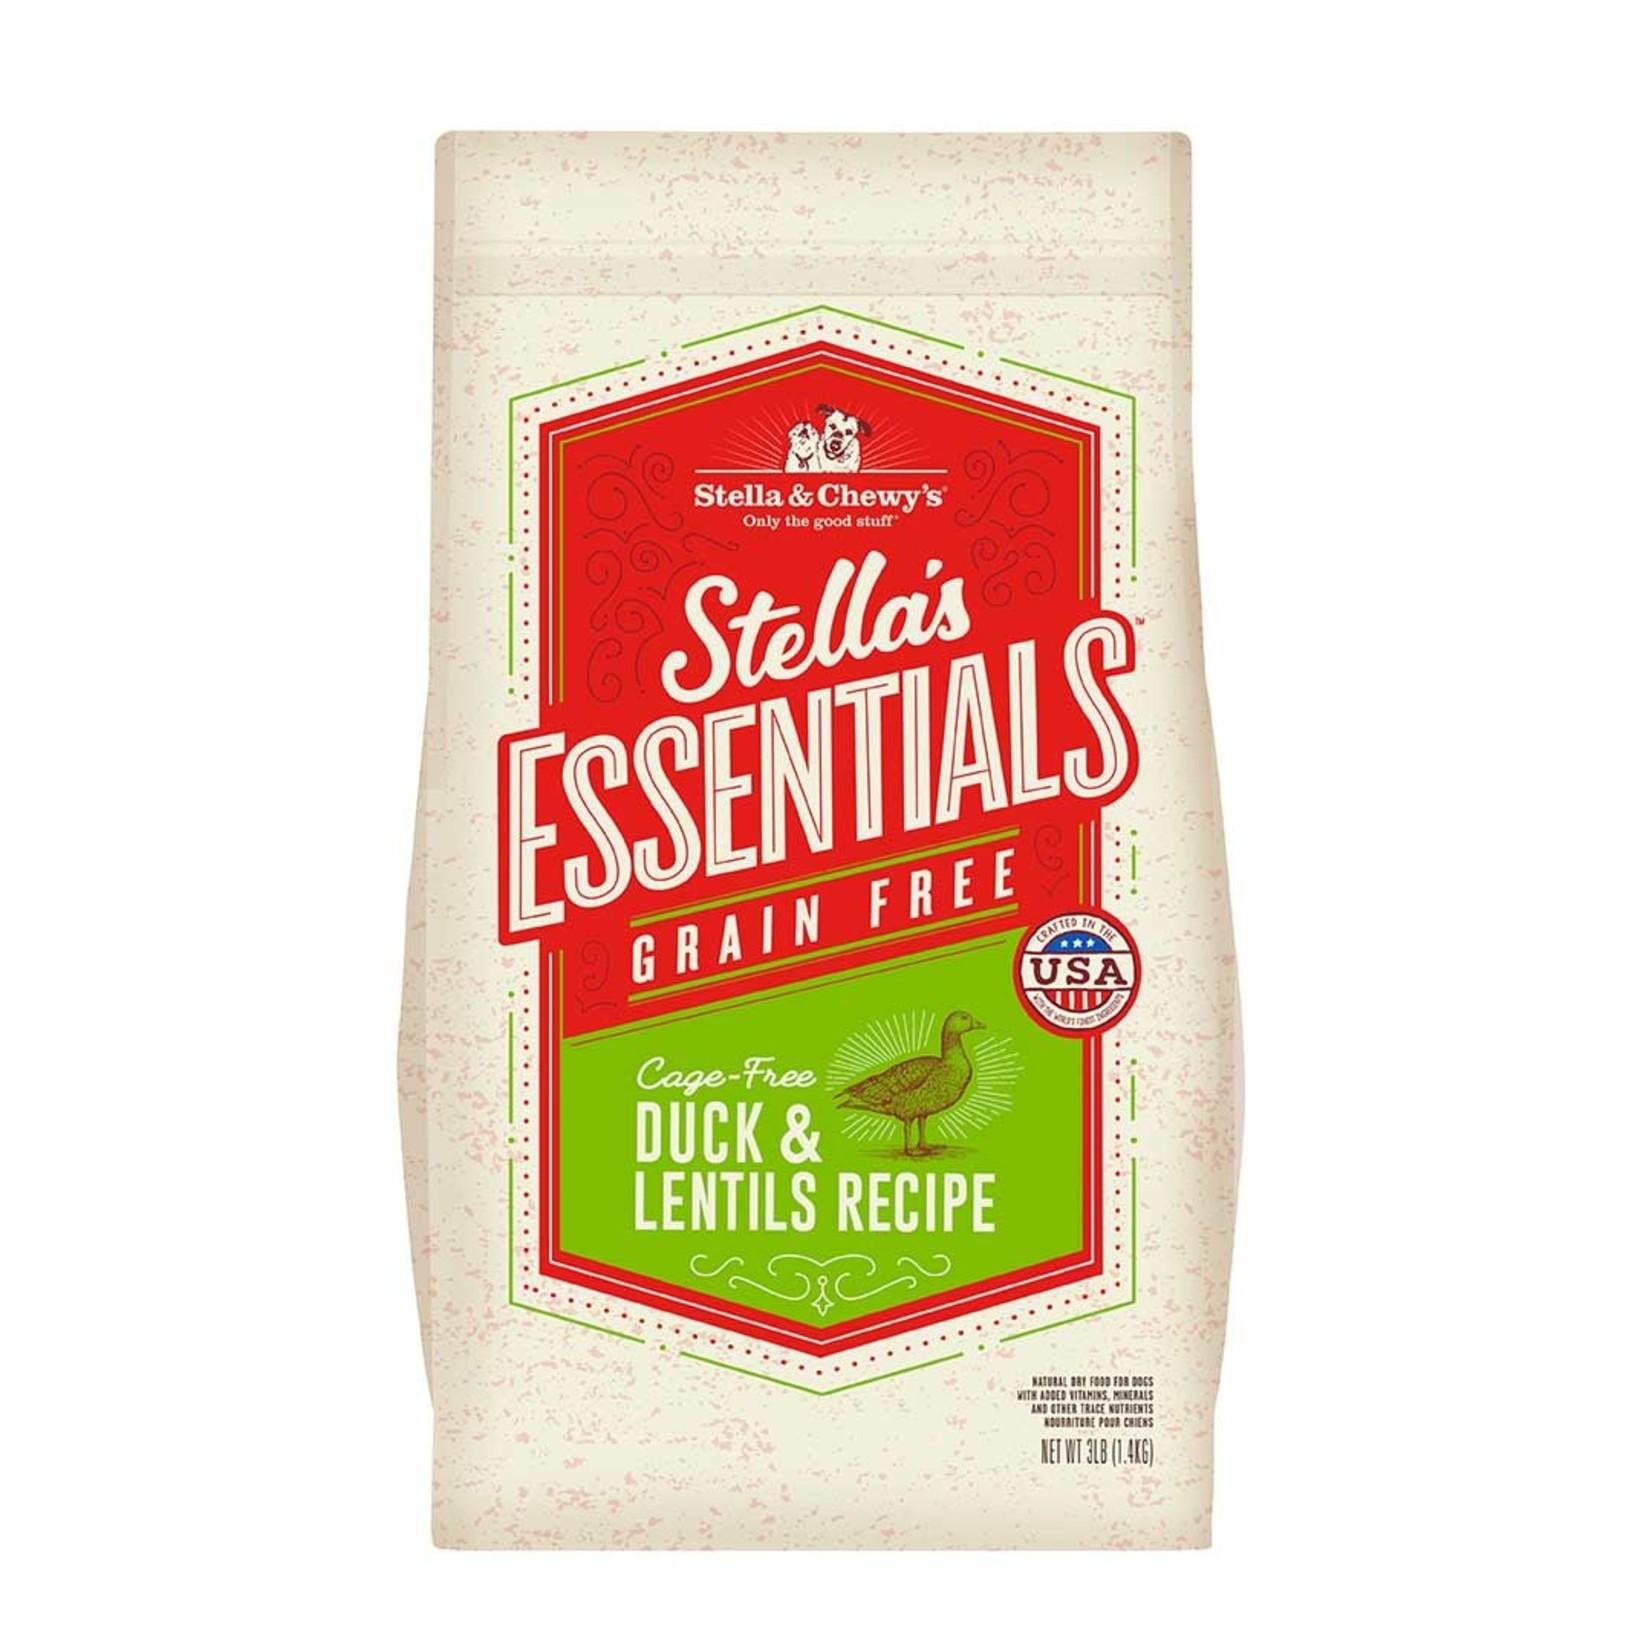 Stella & Chewys Stella & Chewy's Grain Free Duck & Lentil 3#